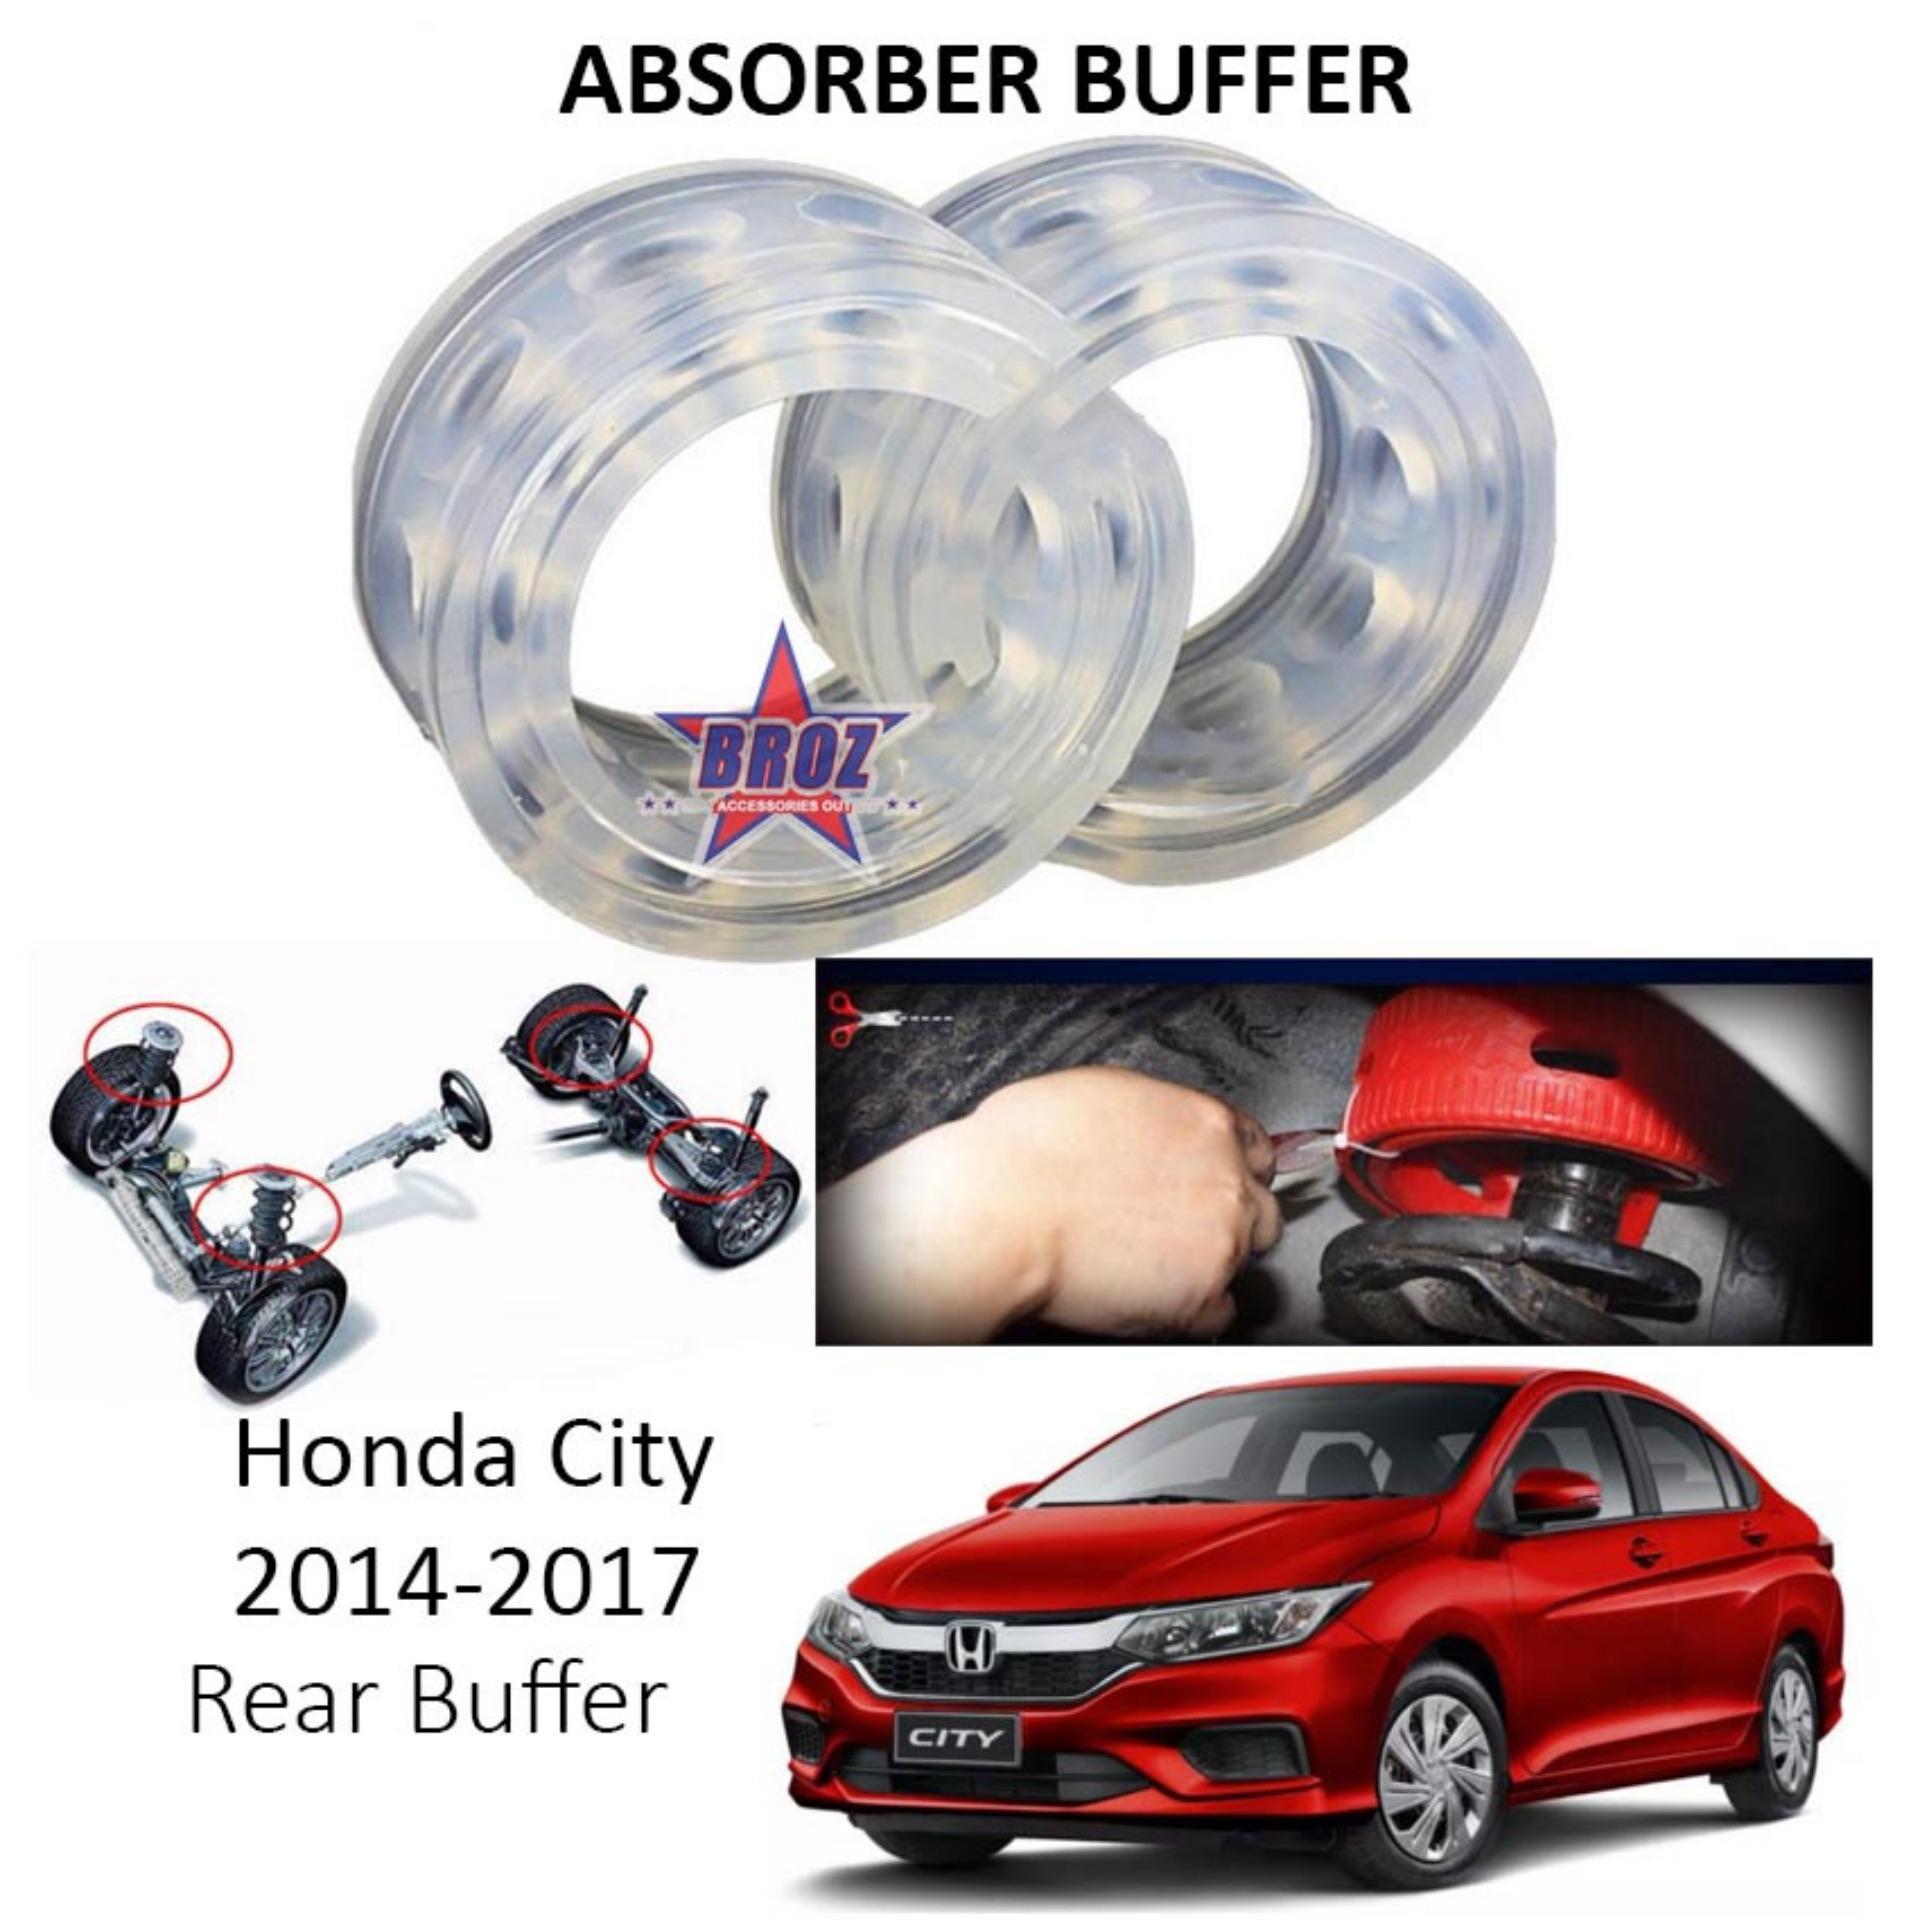 Broz OEM Rear B-Type Car Shock Absorber Buffer /Spring Bumper/ Power Cushion Buffer (Transparent) for City 2014-2017